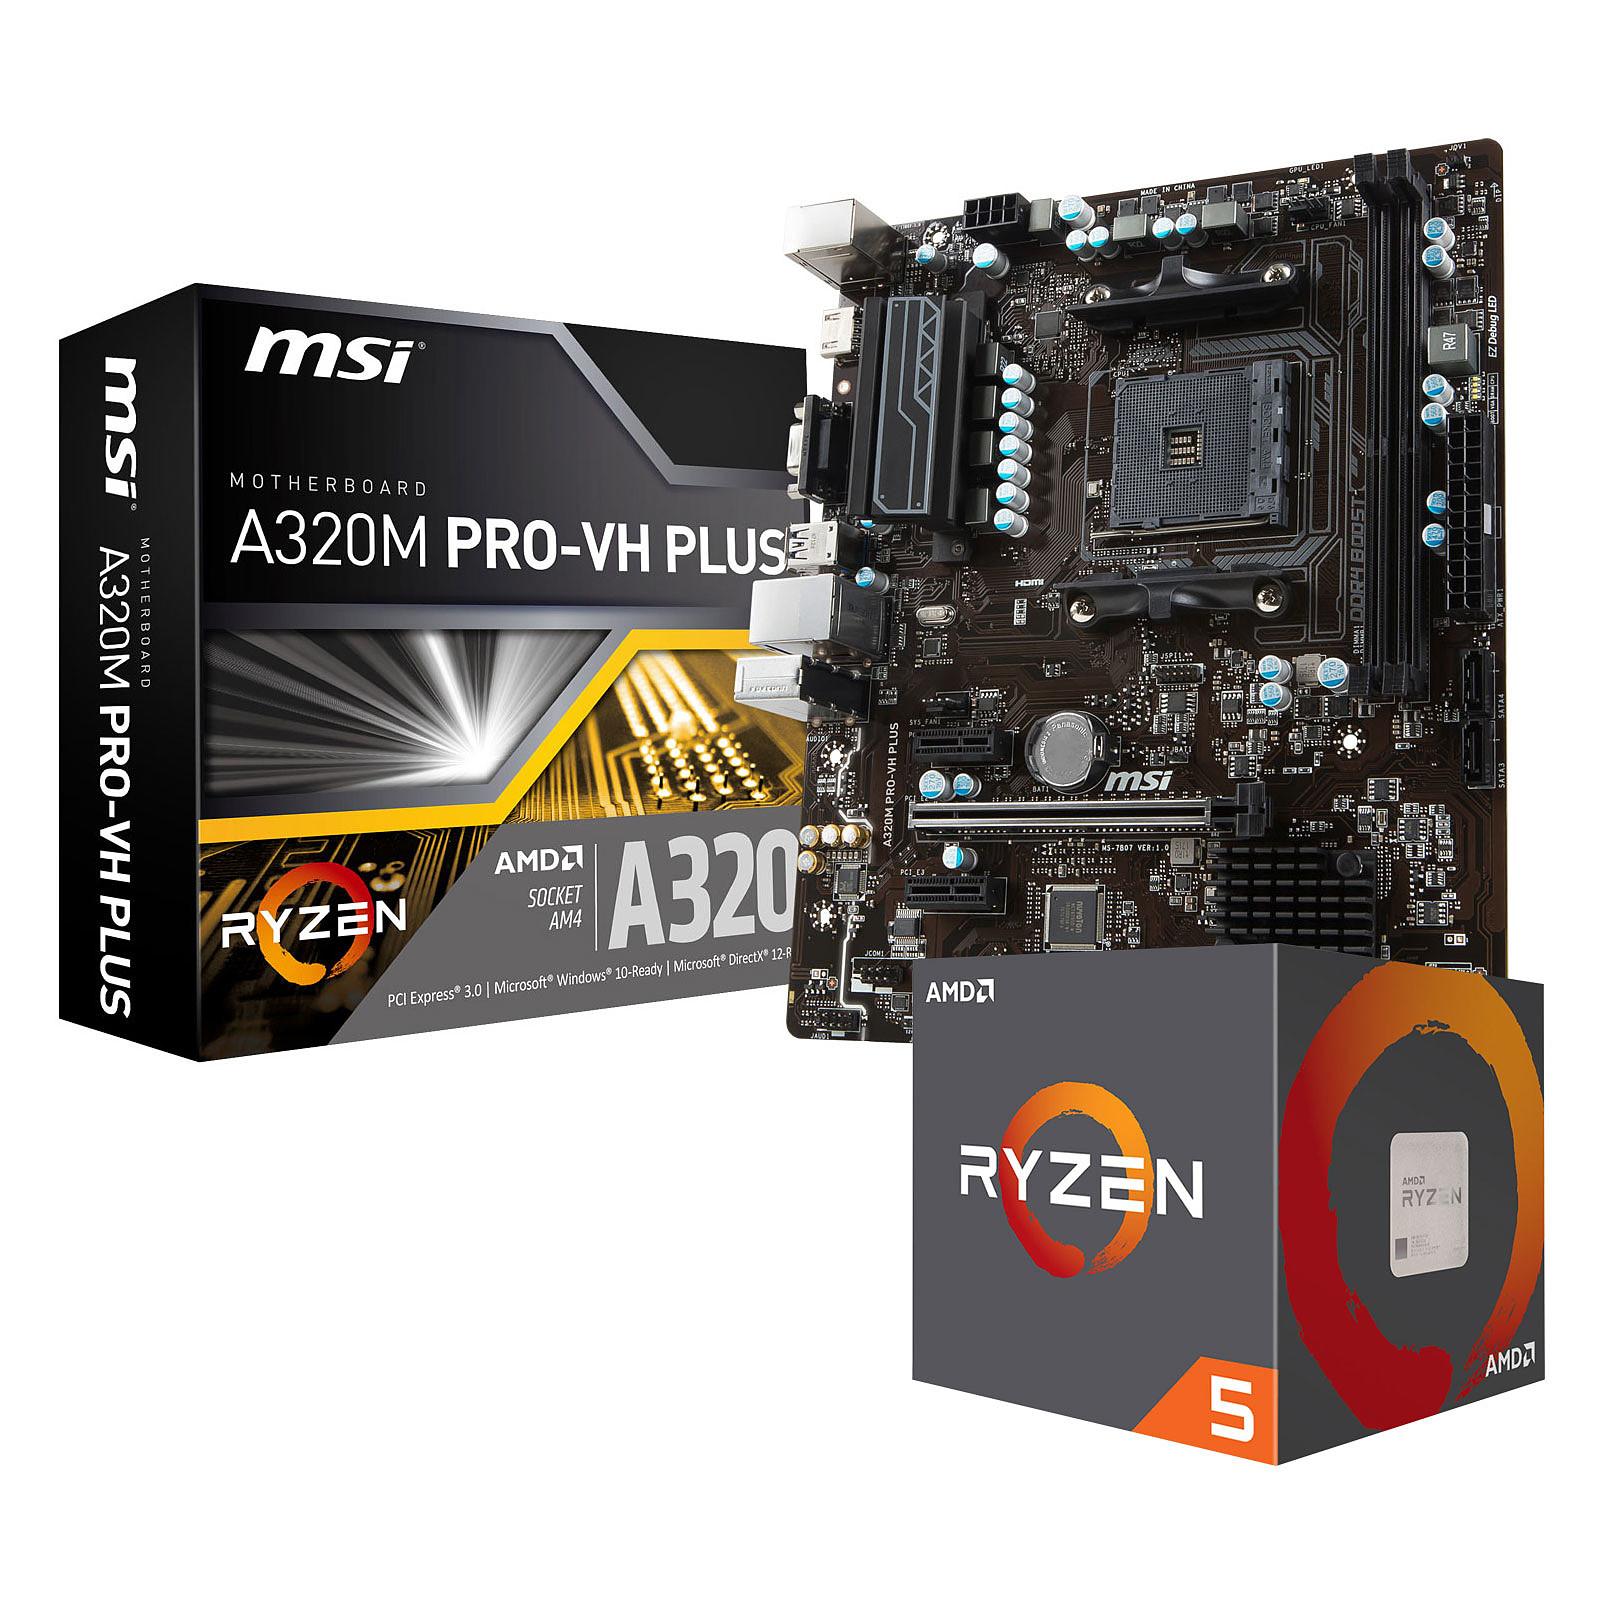 Kit Upgrade PC AMD Ryzen 5 1600 MSI A320M PRO-VH PLUS